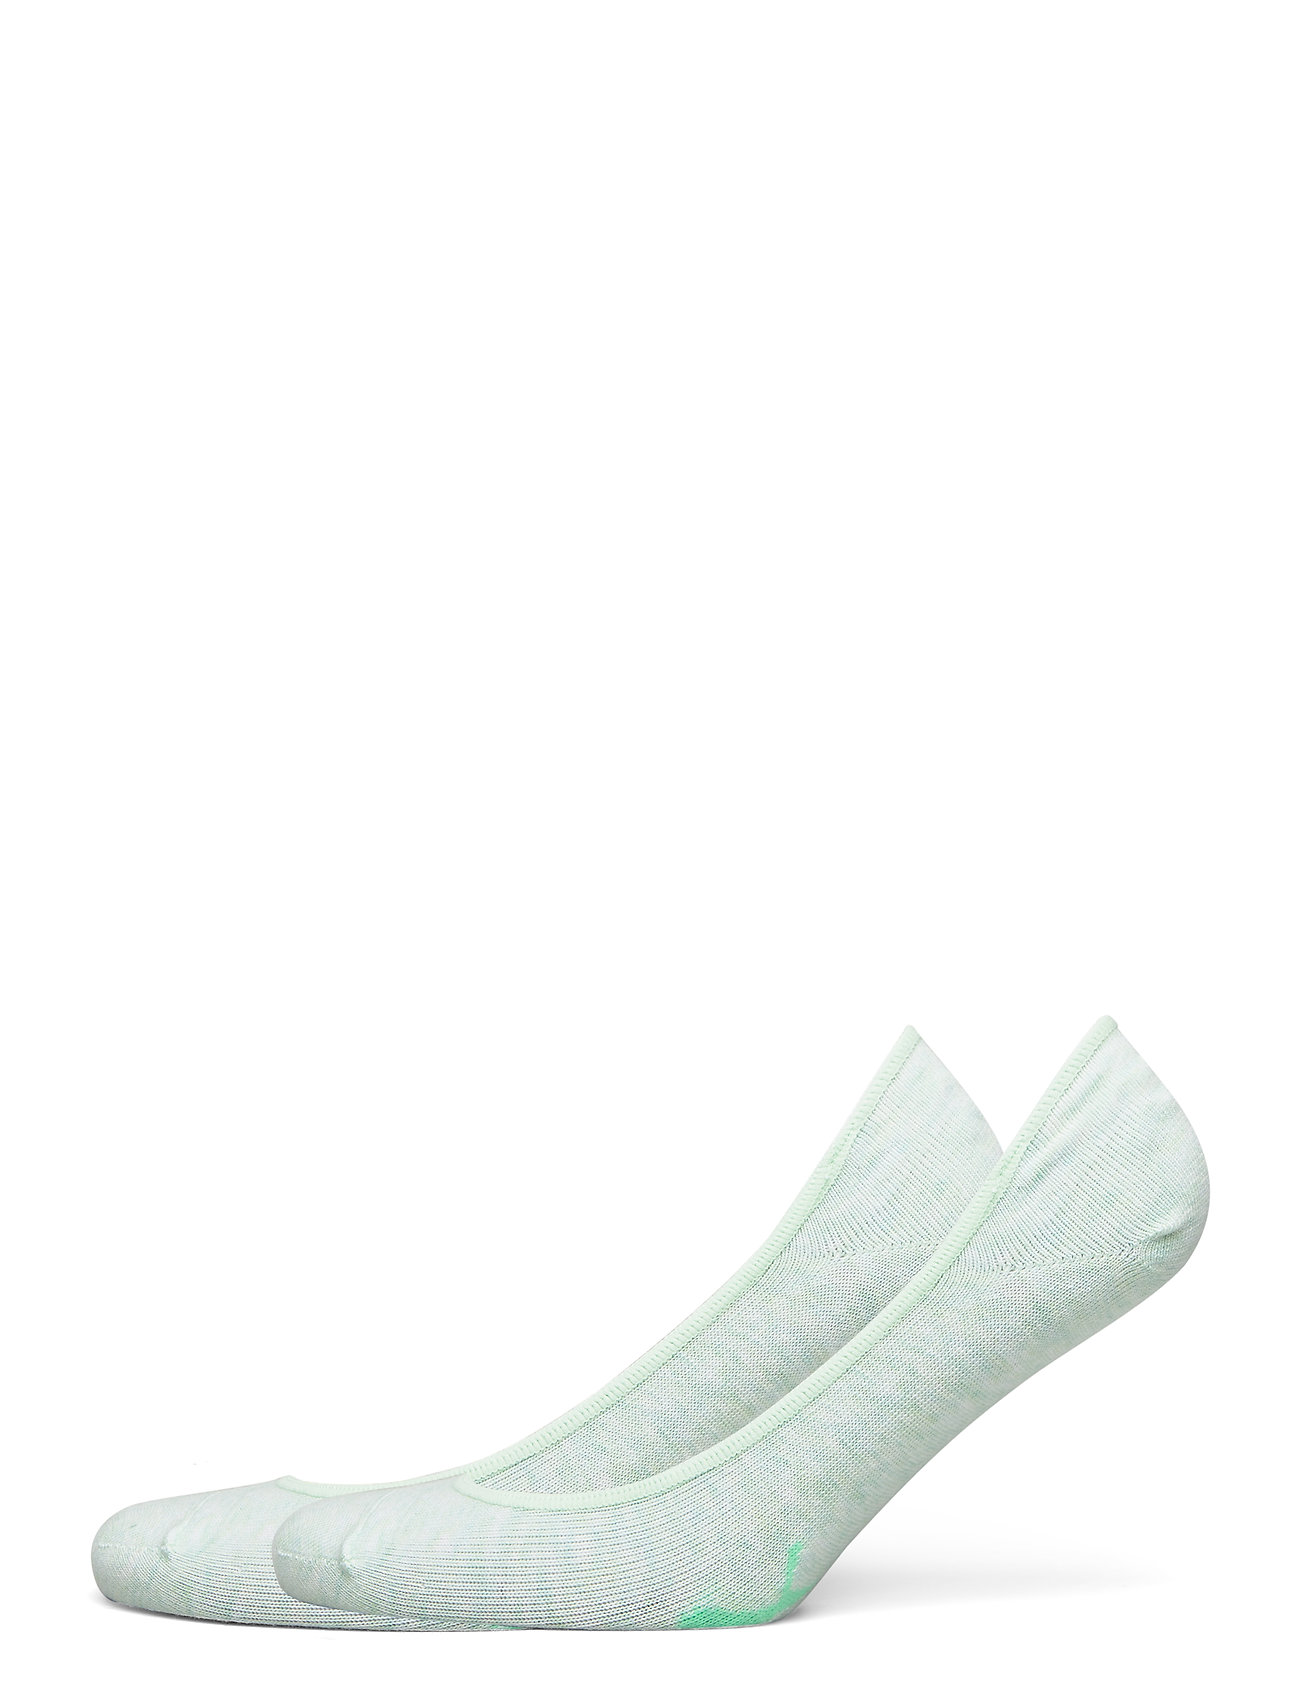 Image of Puma Women Footie 2p Lingerie Socks Footies/Ankle Socks Grøn PUMA (3416363409)